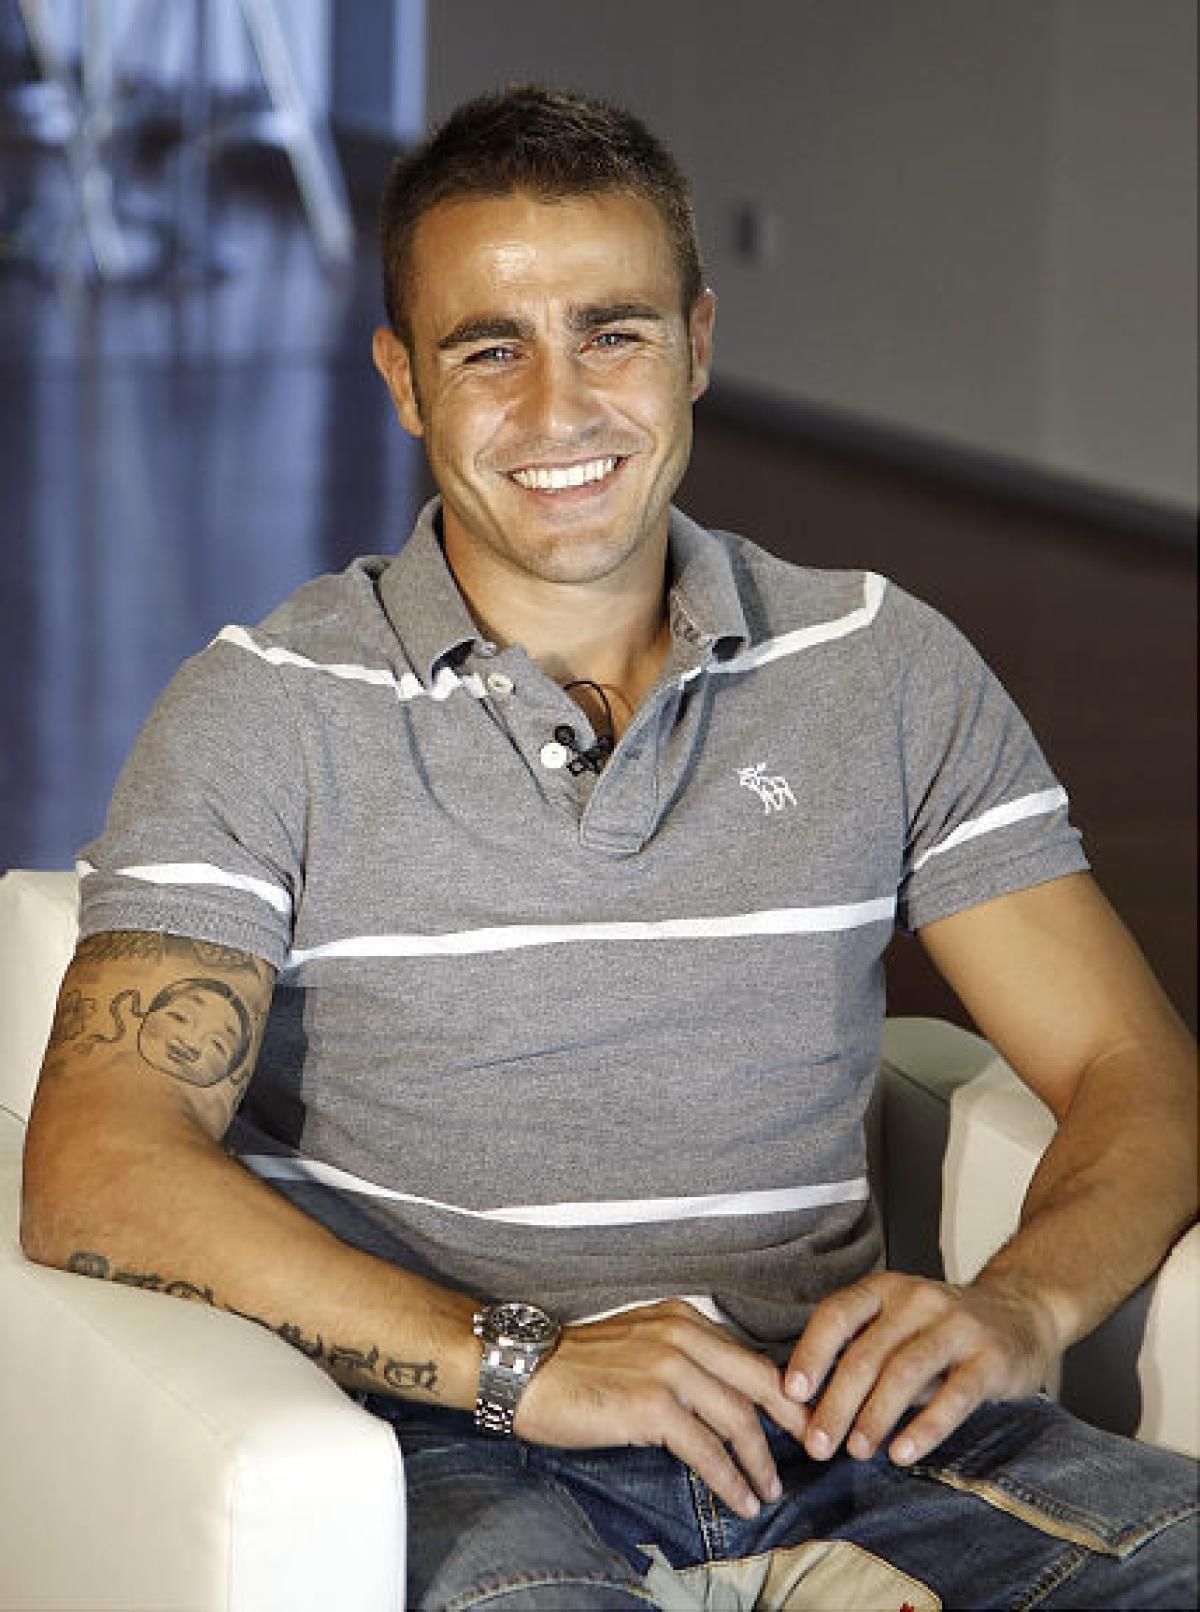 Italian Hotties Ideal italian juventus player fabio cannavarro has a smile that could